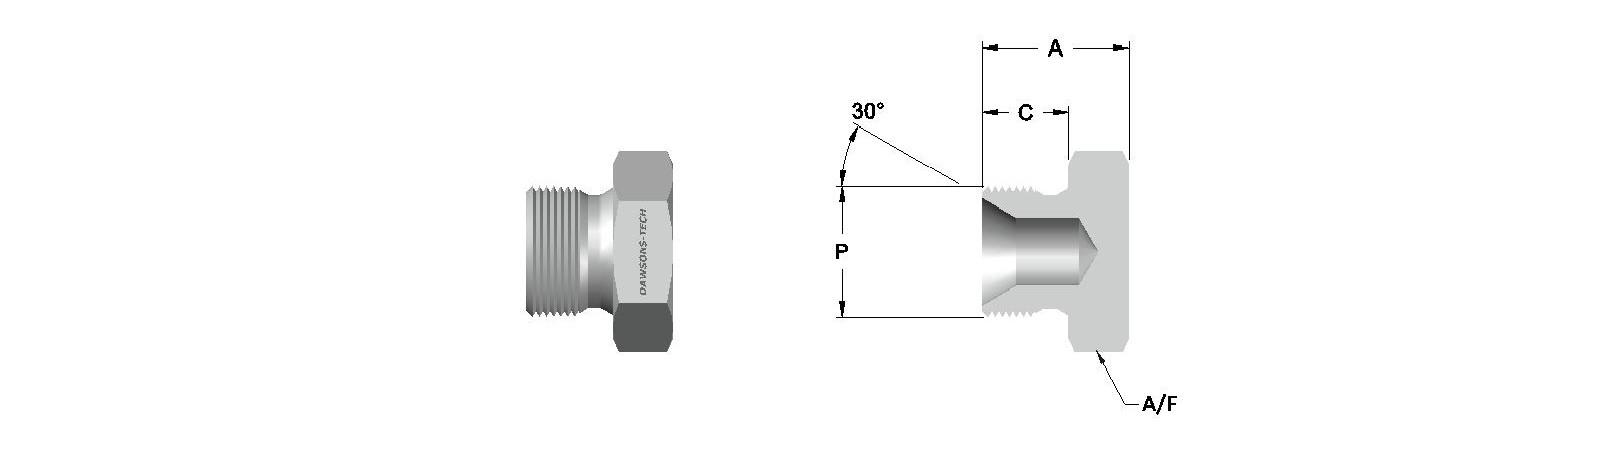 10 Hex Plug BSP (Parallel) Thread-Model-B